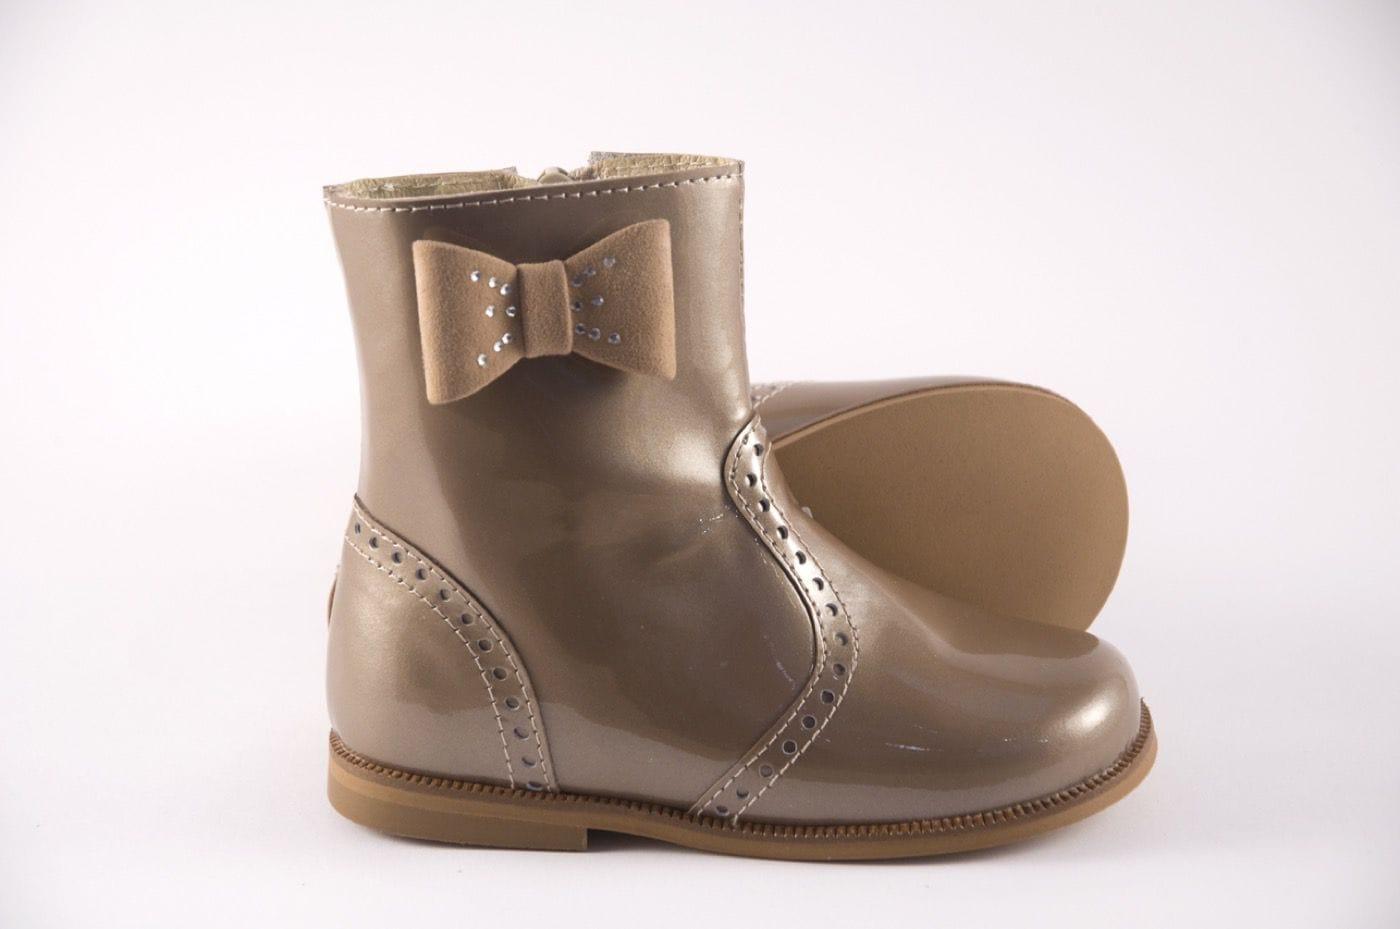 29f118762a0 Comprar zapato tipo JOVEN NIÑA estilo BOTINES-BOTA ALTA COLOR BEIGE ...